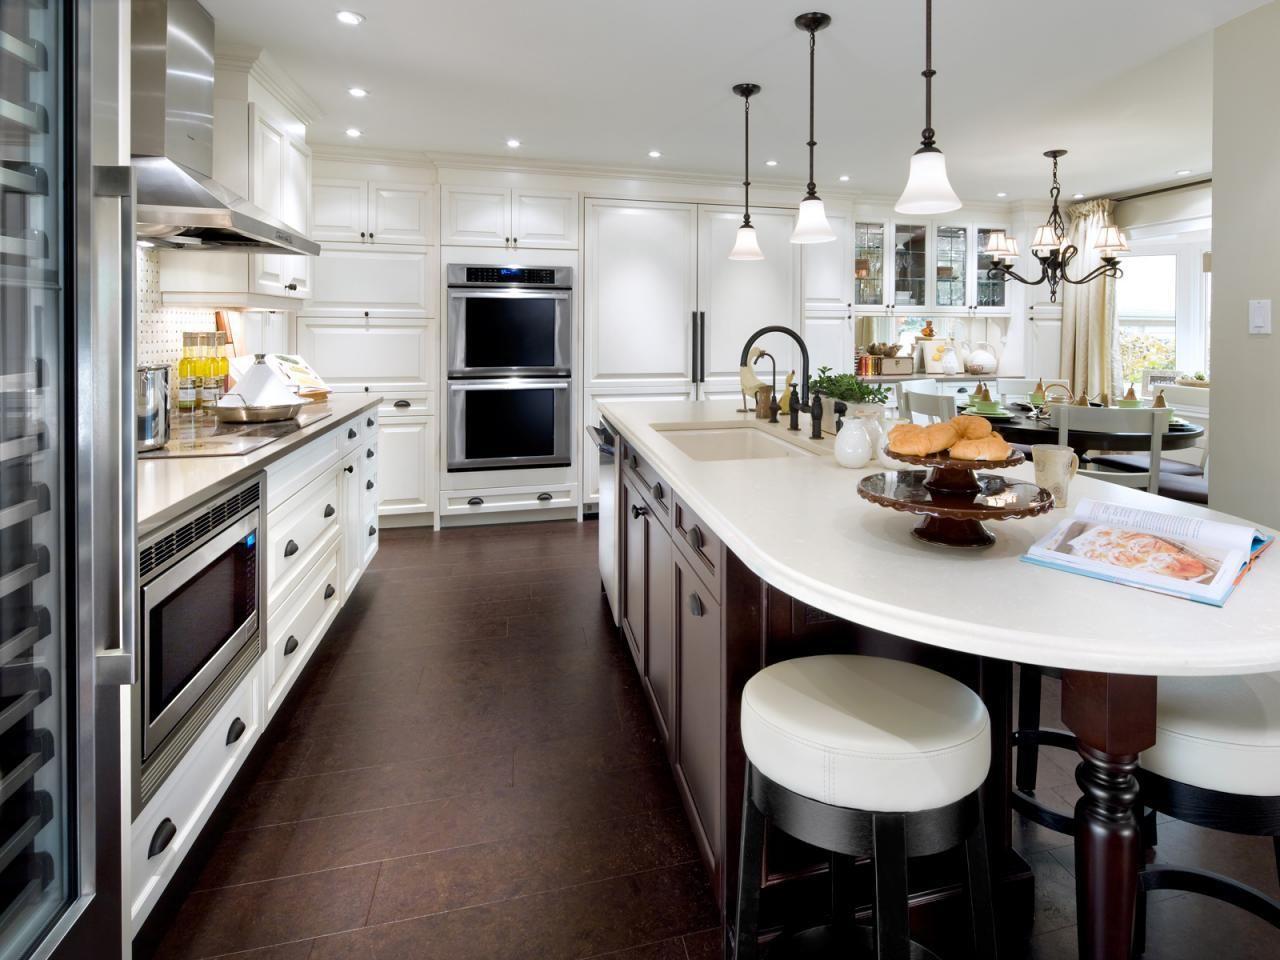 Uncategorized Candice Olson Kitchen Designs inviting kitchen designs candice olson ideas design design